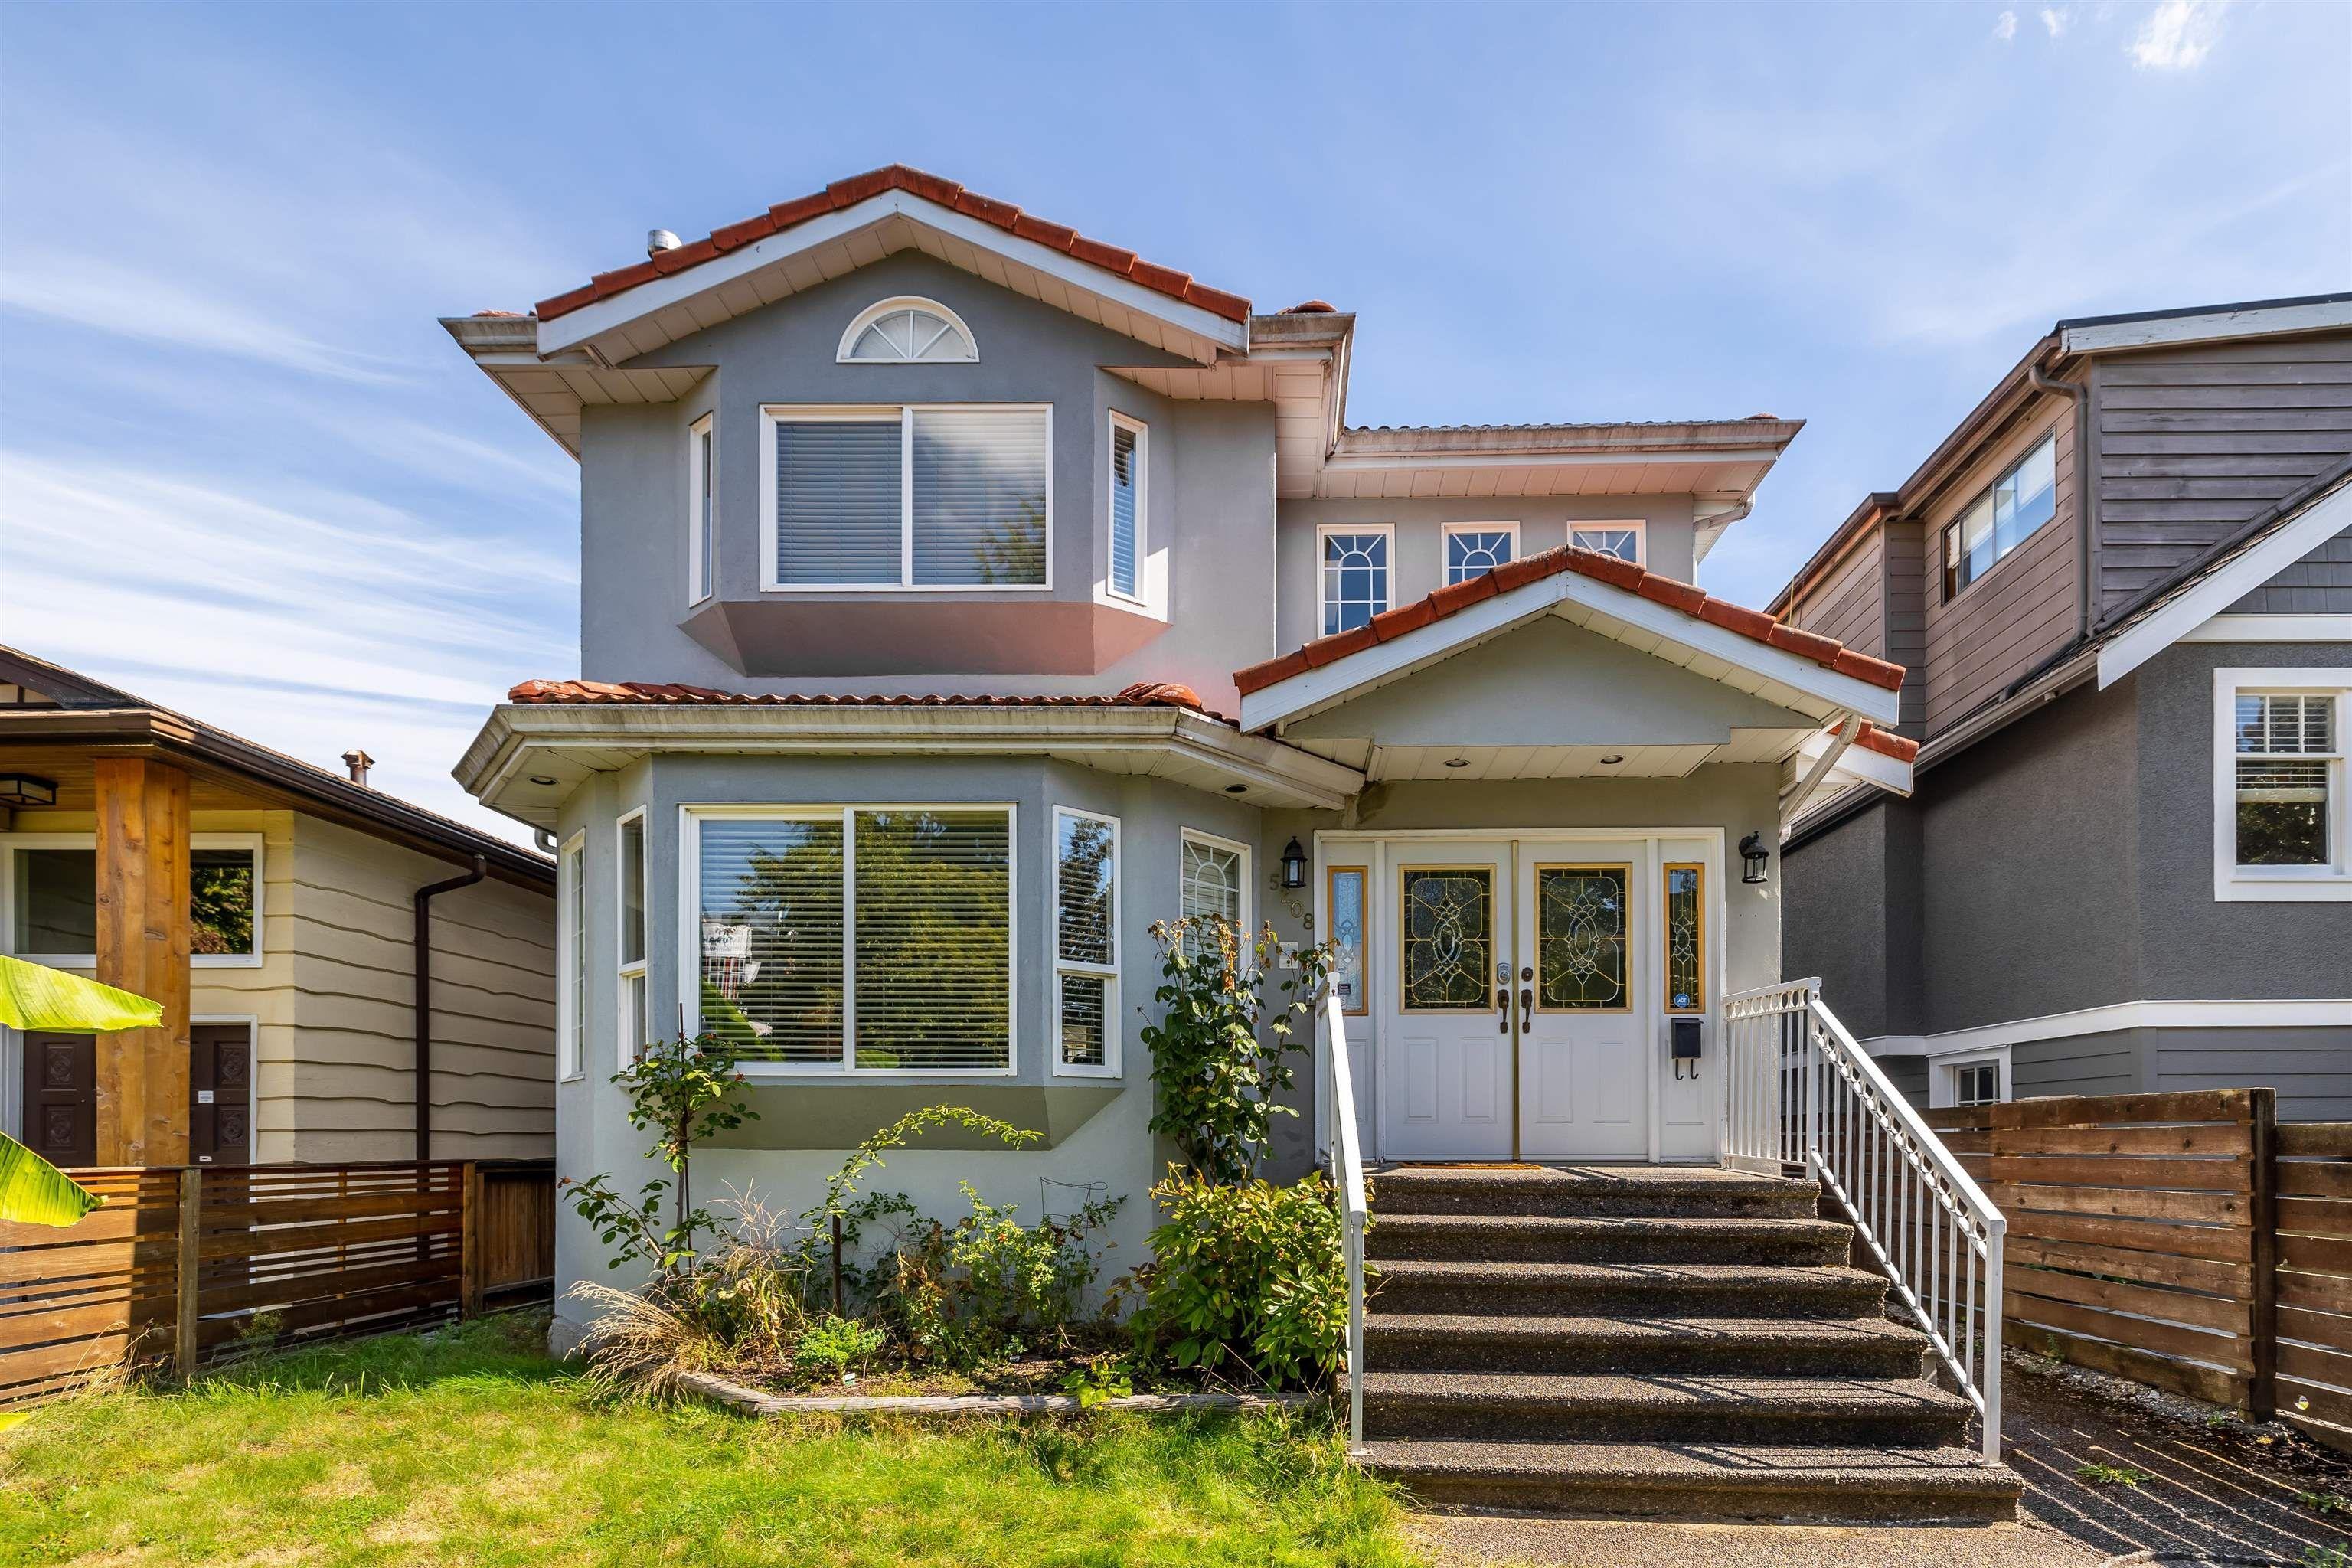 Main Photo: 5208 WINDSOR Street in Vancouver: Fraser VE House for sale (Vancouver East)  : MLS®# R2619079